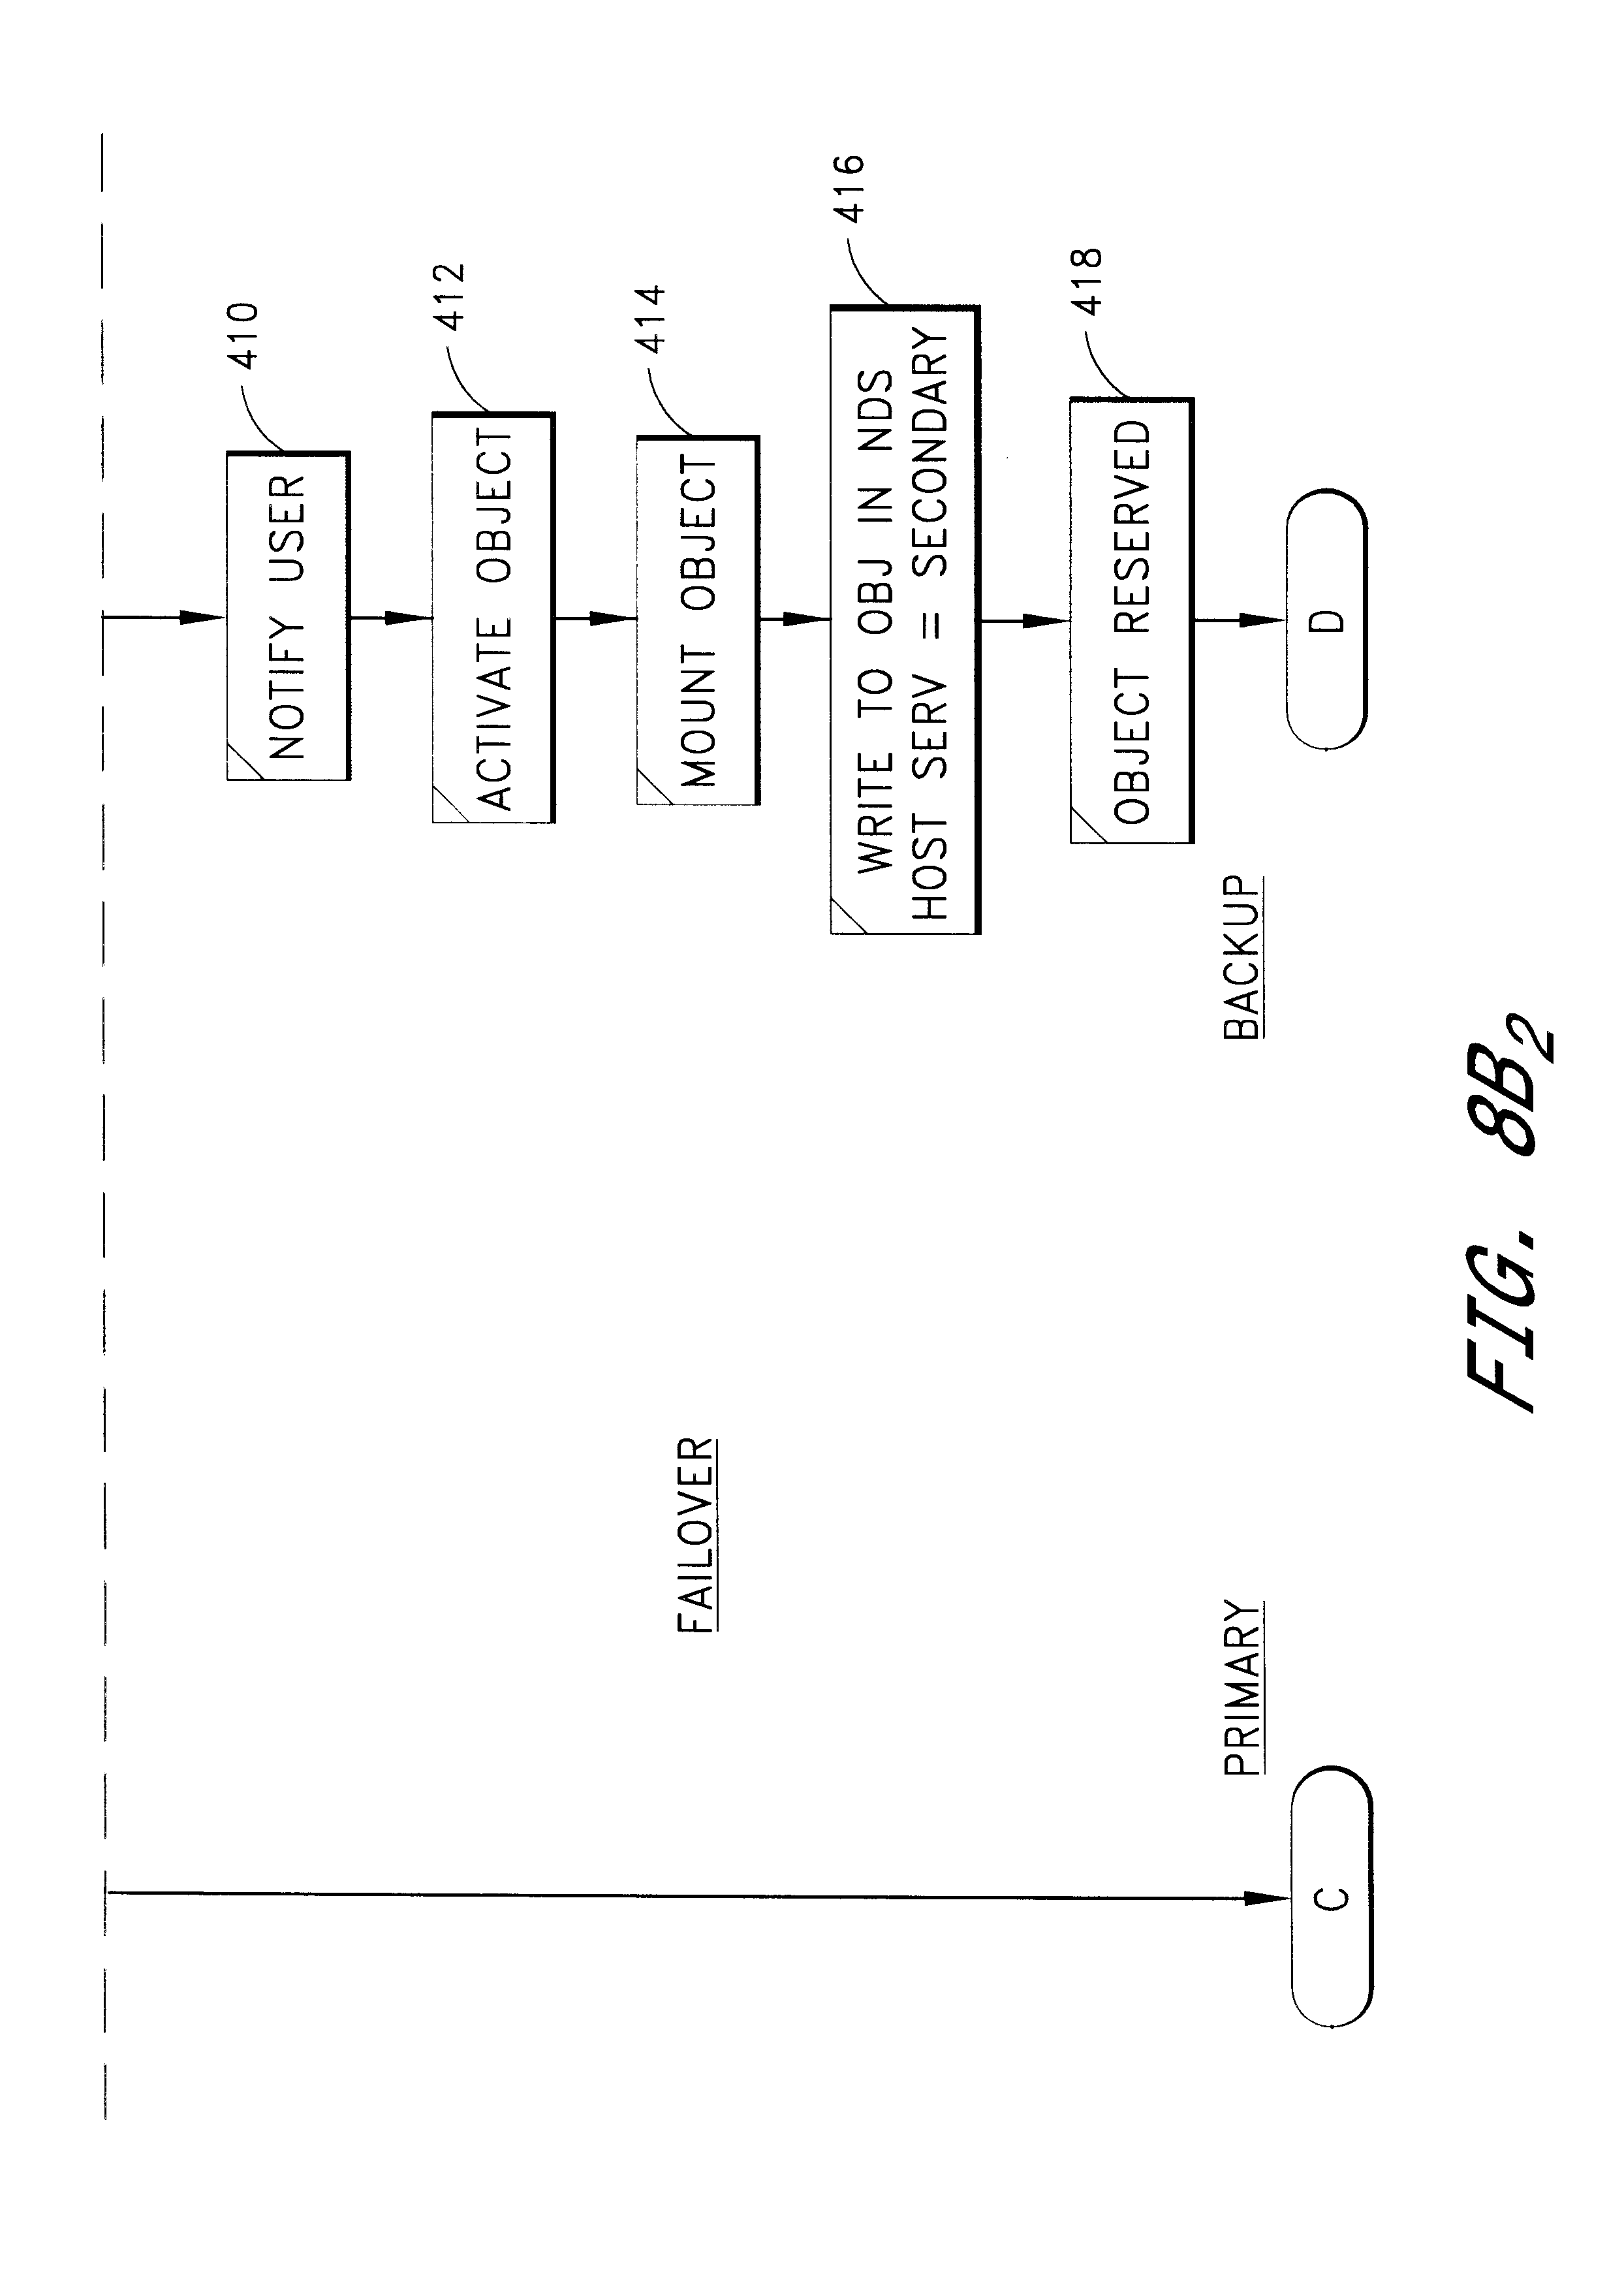 Patent US 6,292,905 B1